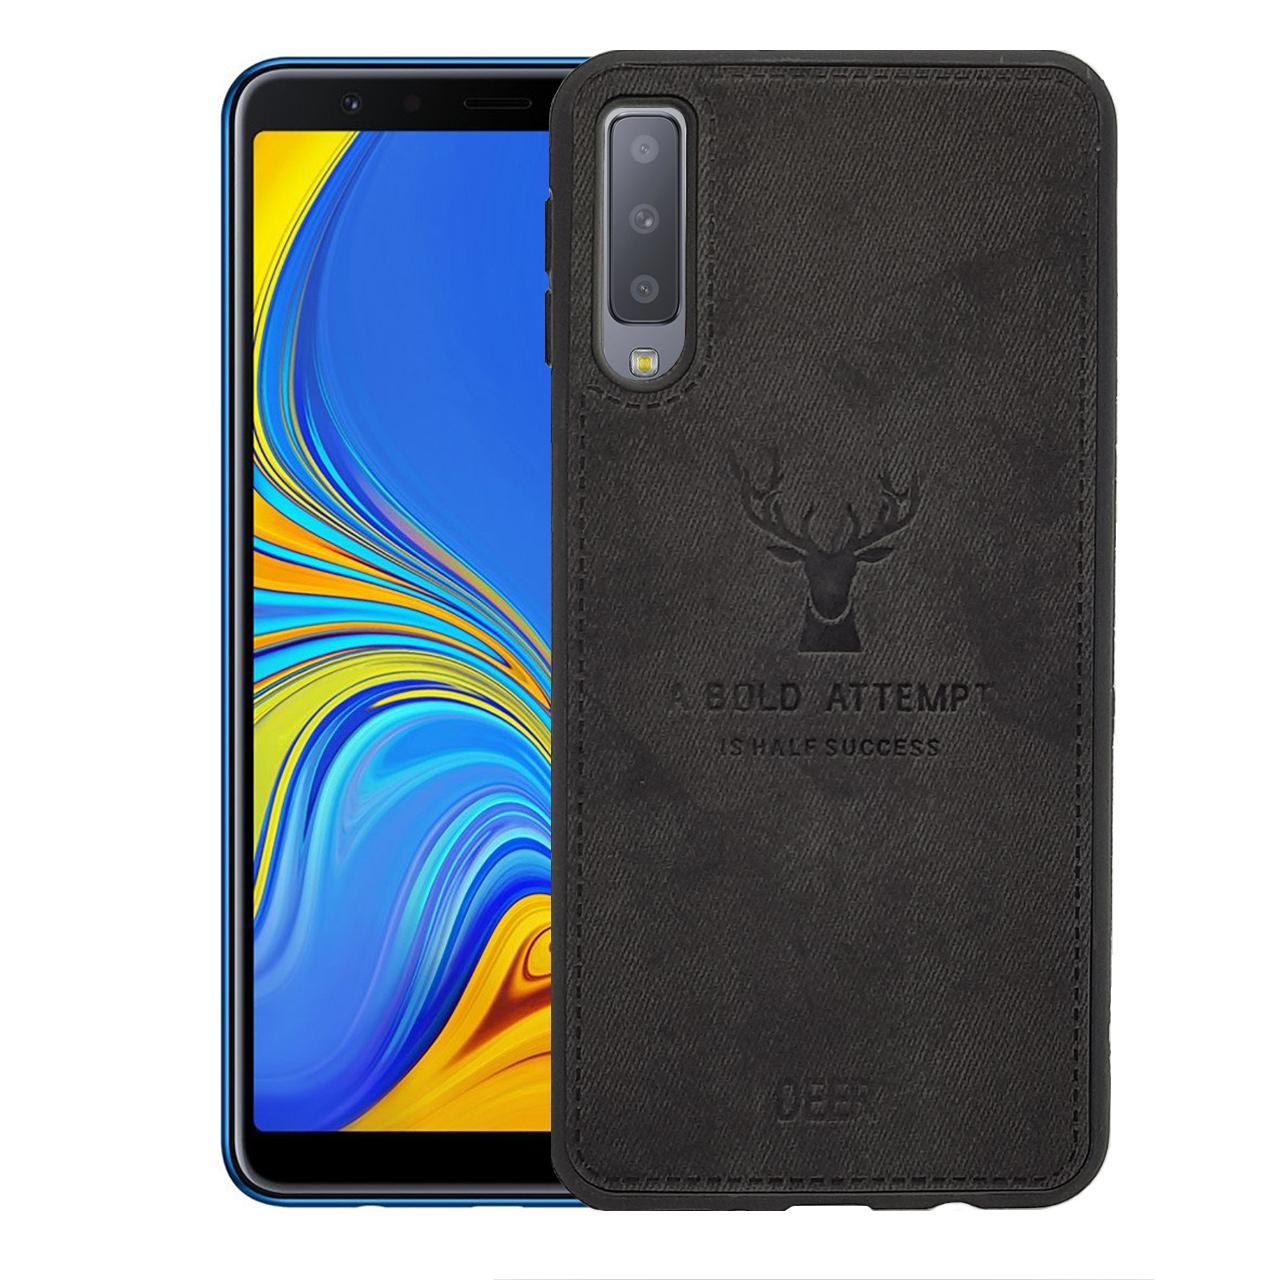 کاور مدل Deer مناسب برای گوشی موبایل سامسونگ Galaxy A7 2018